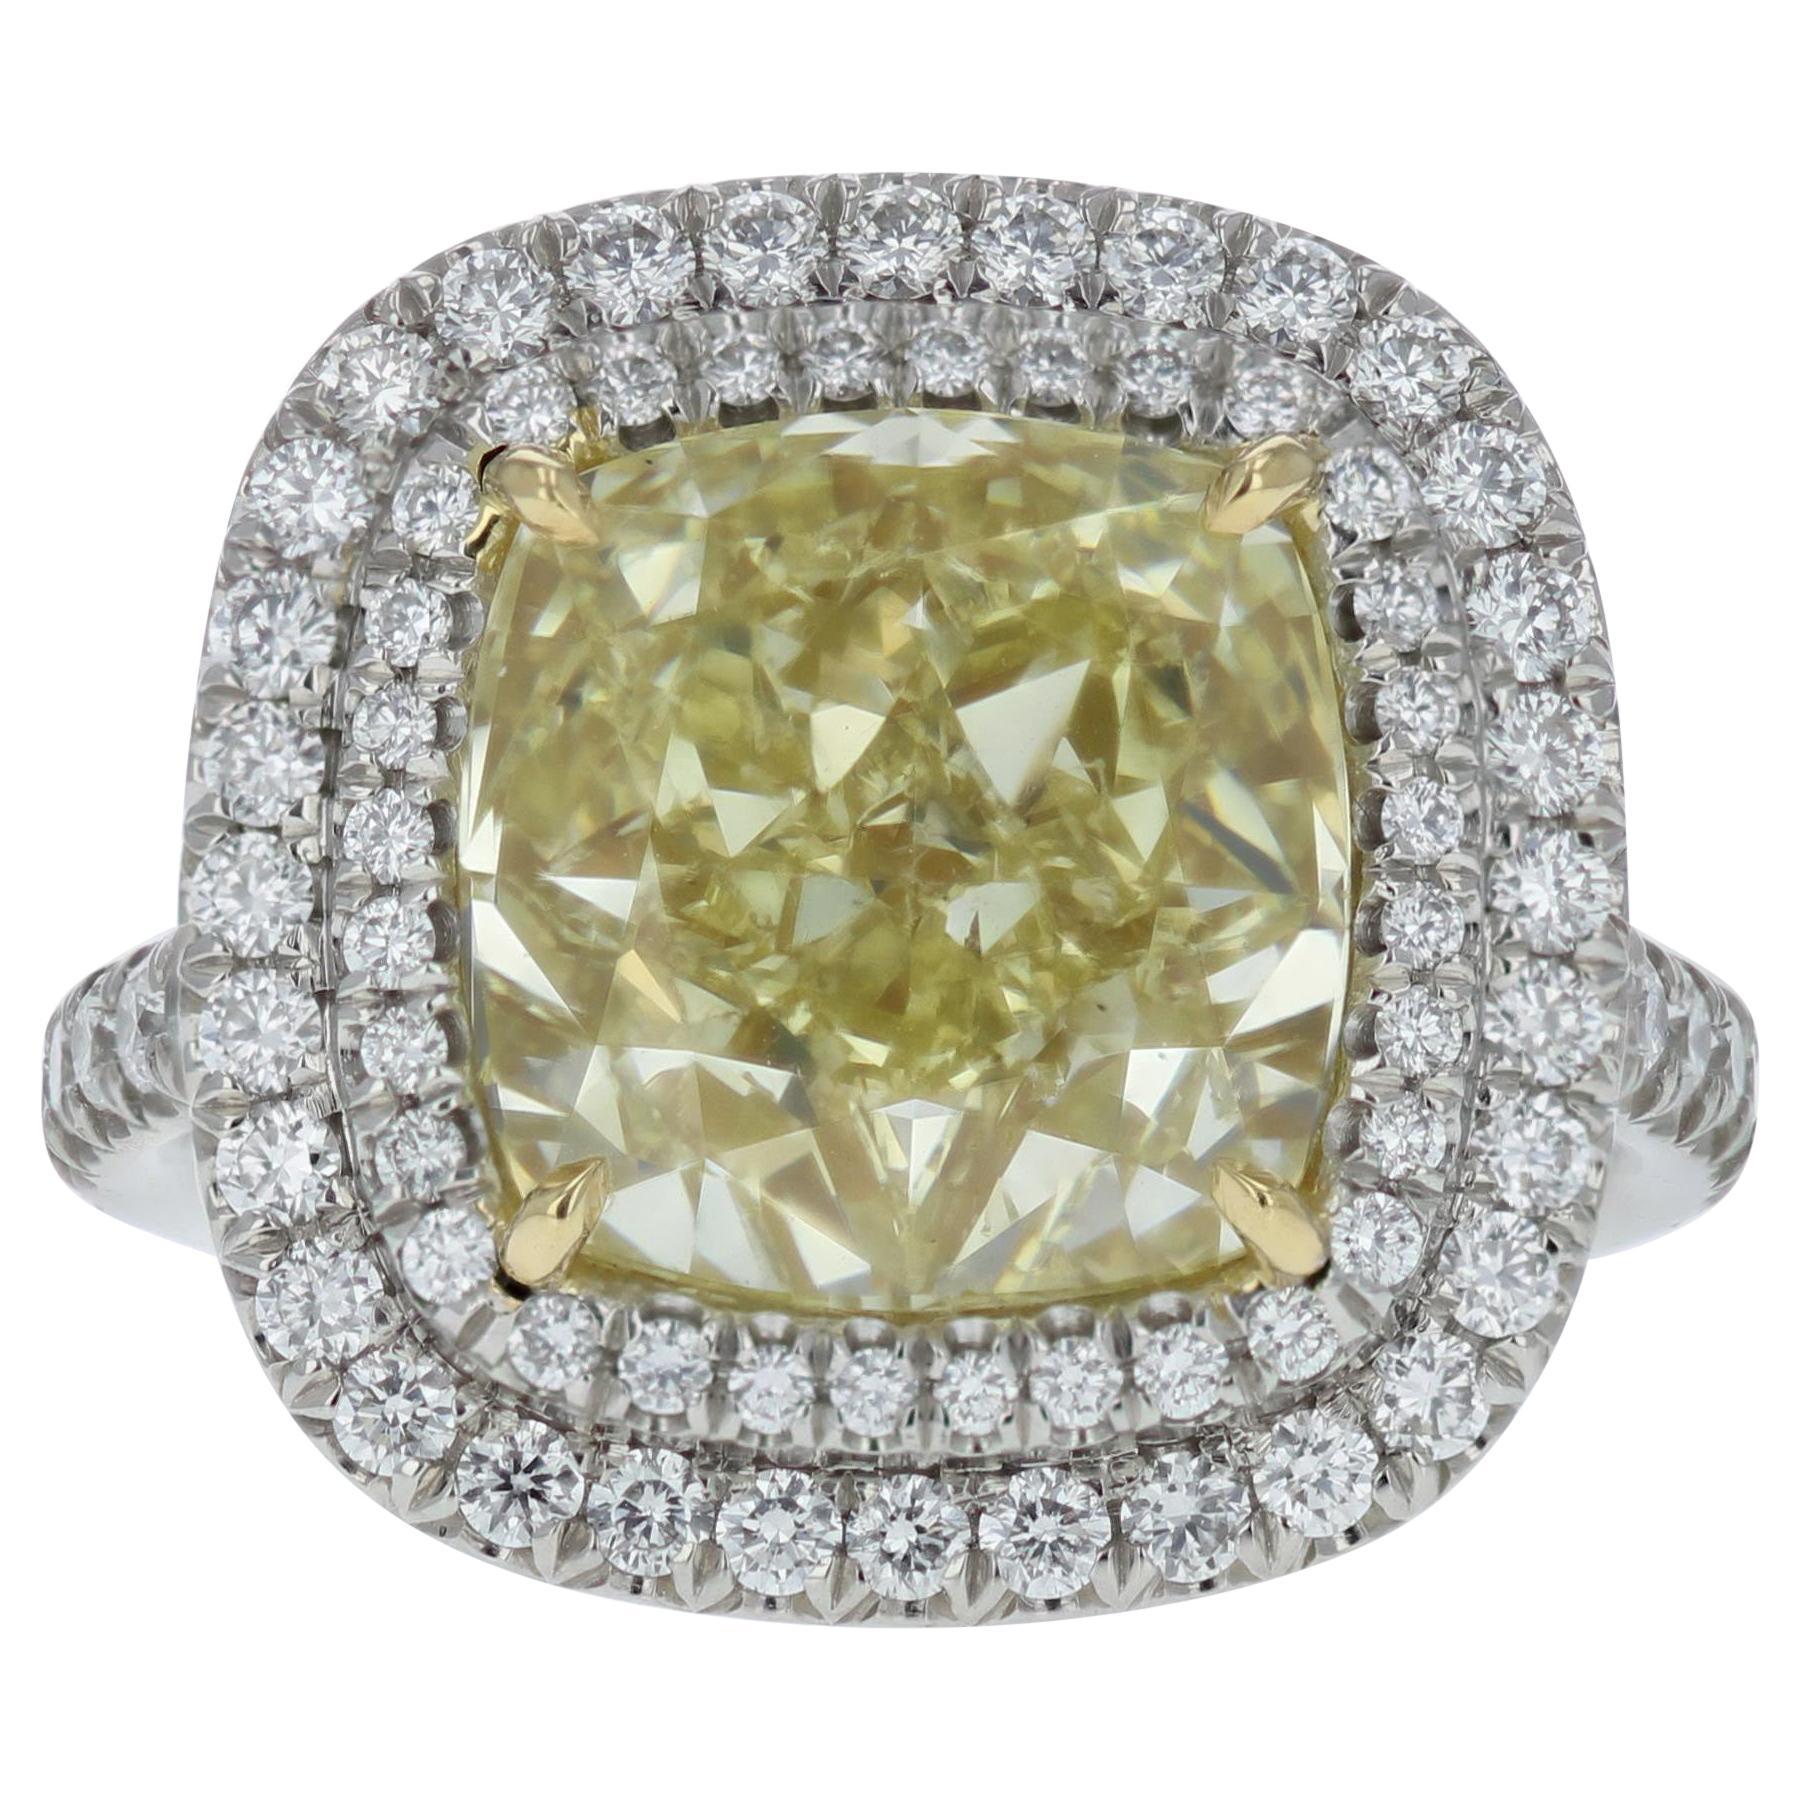 GIA Certified 7.02 Carat Yellow Cushion Cut Diamond Cocktail Ring